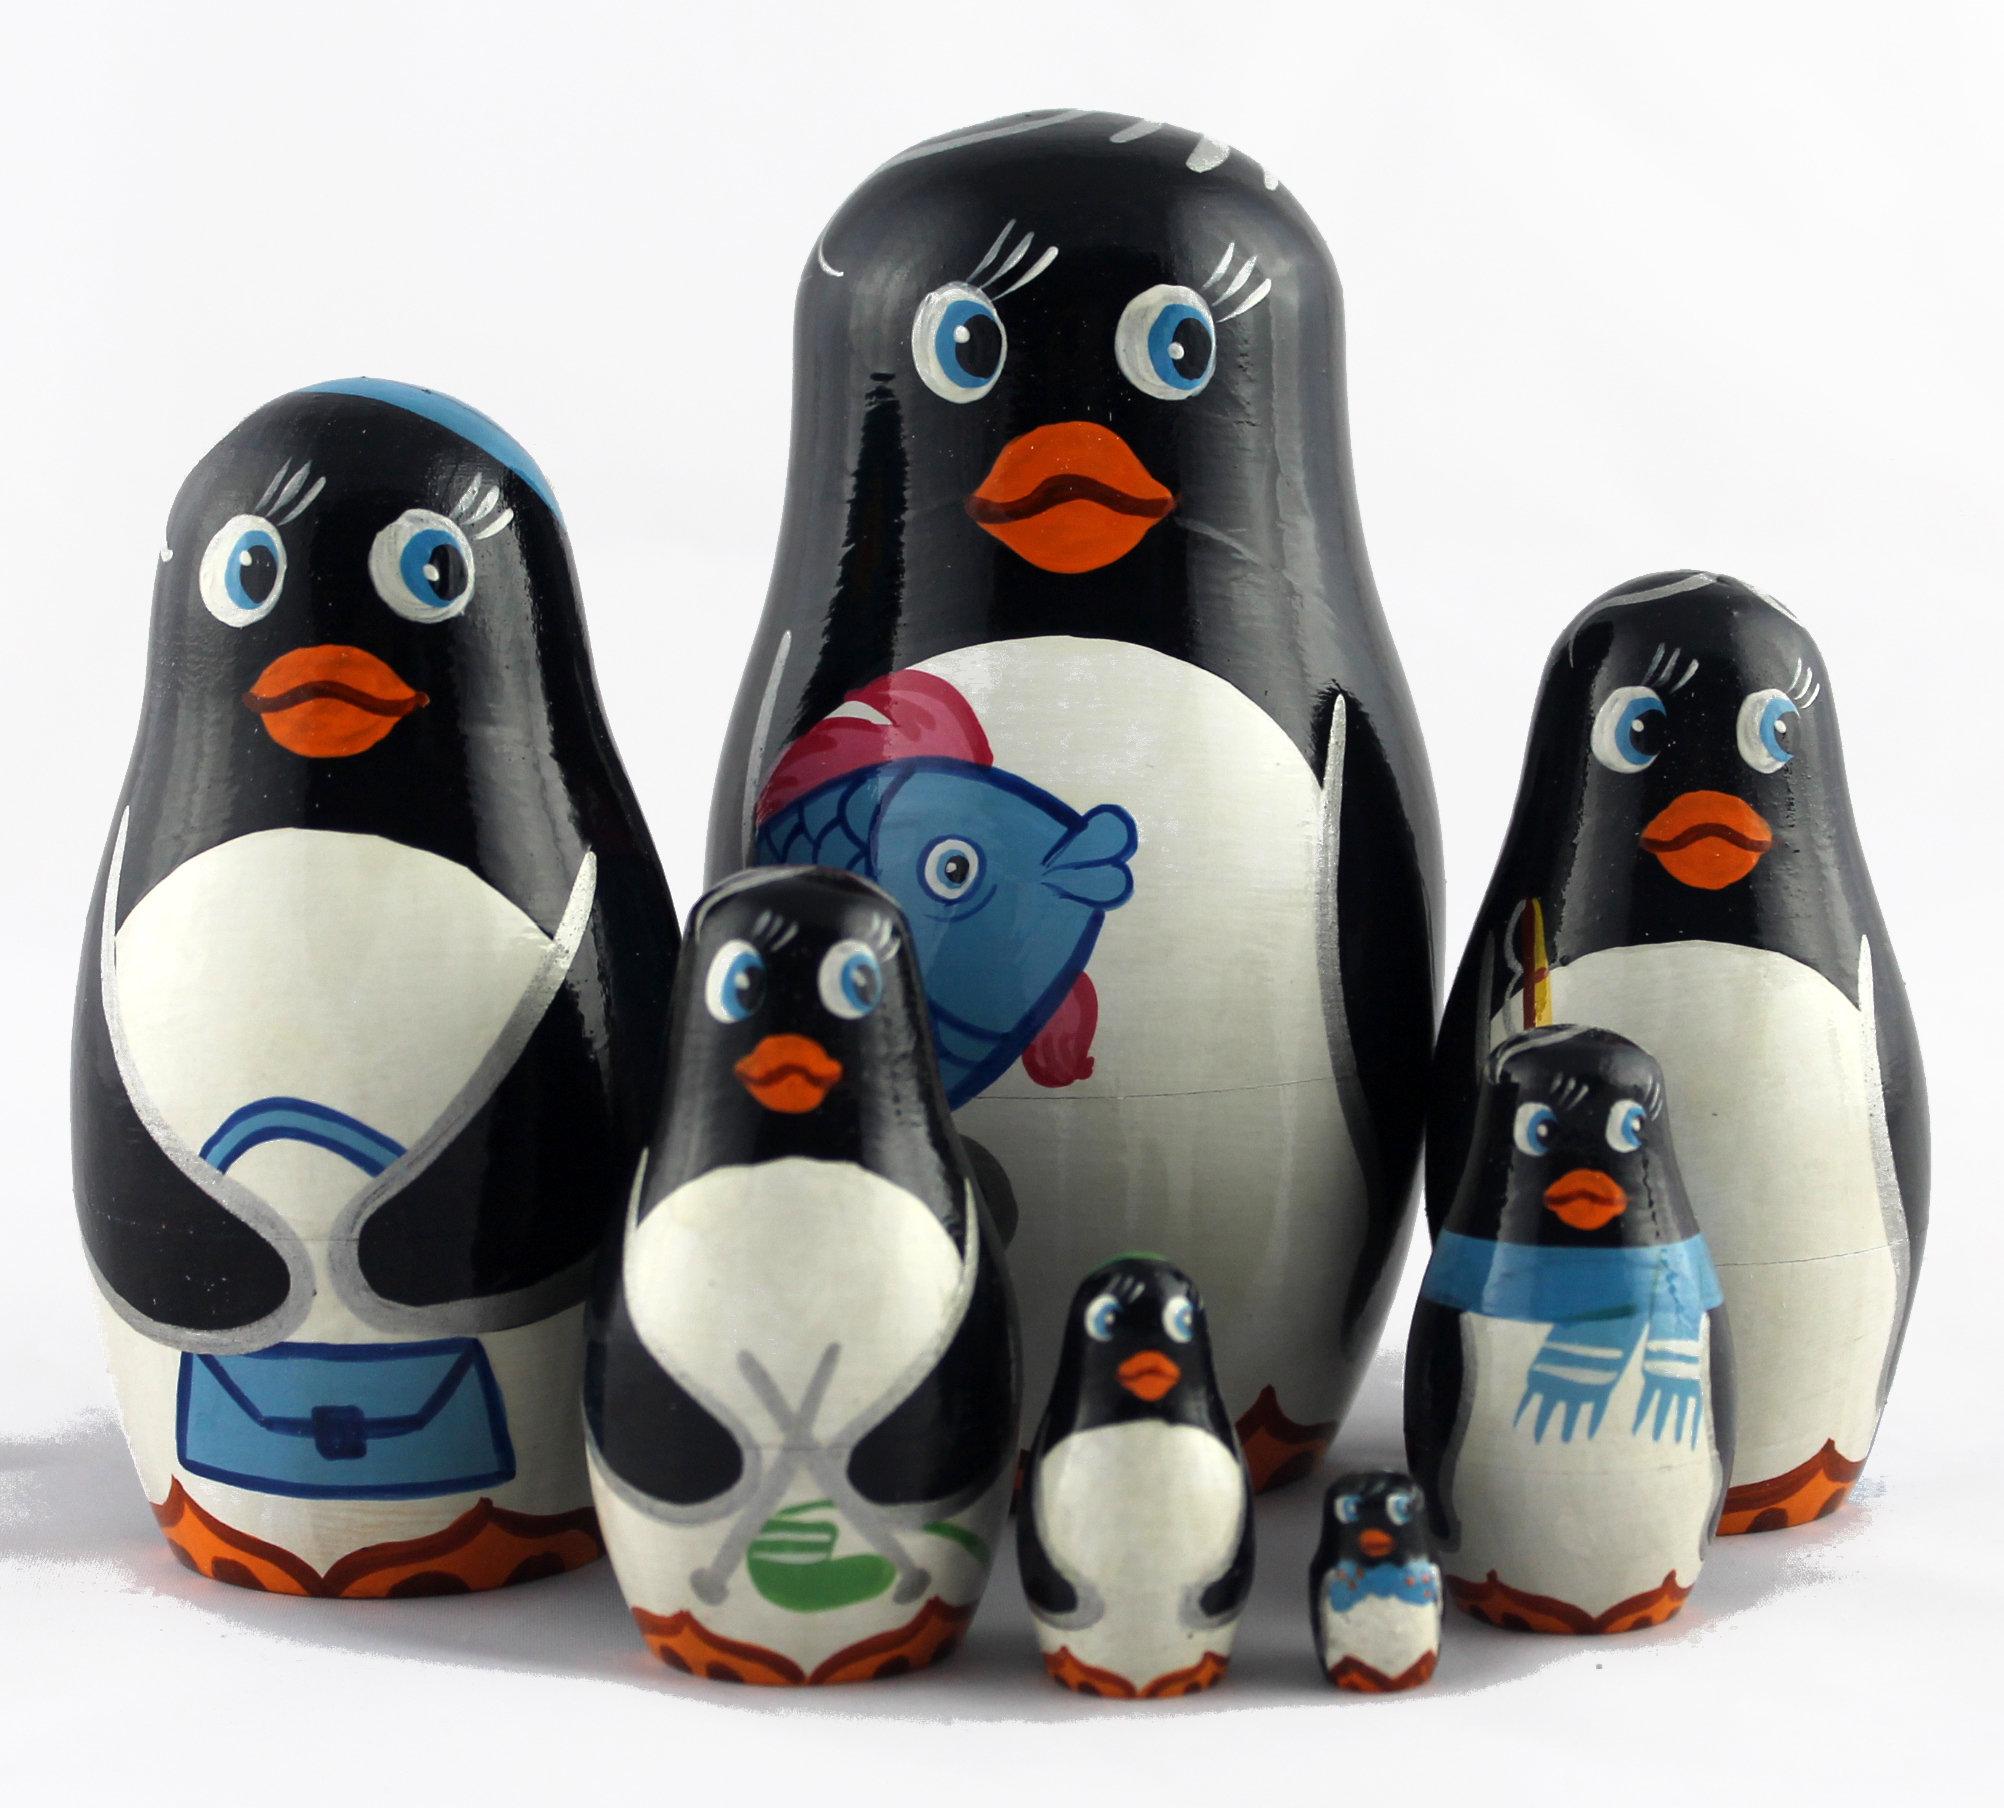 pinguine matrjoschka babuschka holzwohnkultur brut stapeln puppen geschenke souvenirs aus. Black Bedroom Furniture Sets. Home Design Ideas